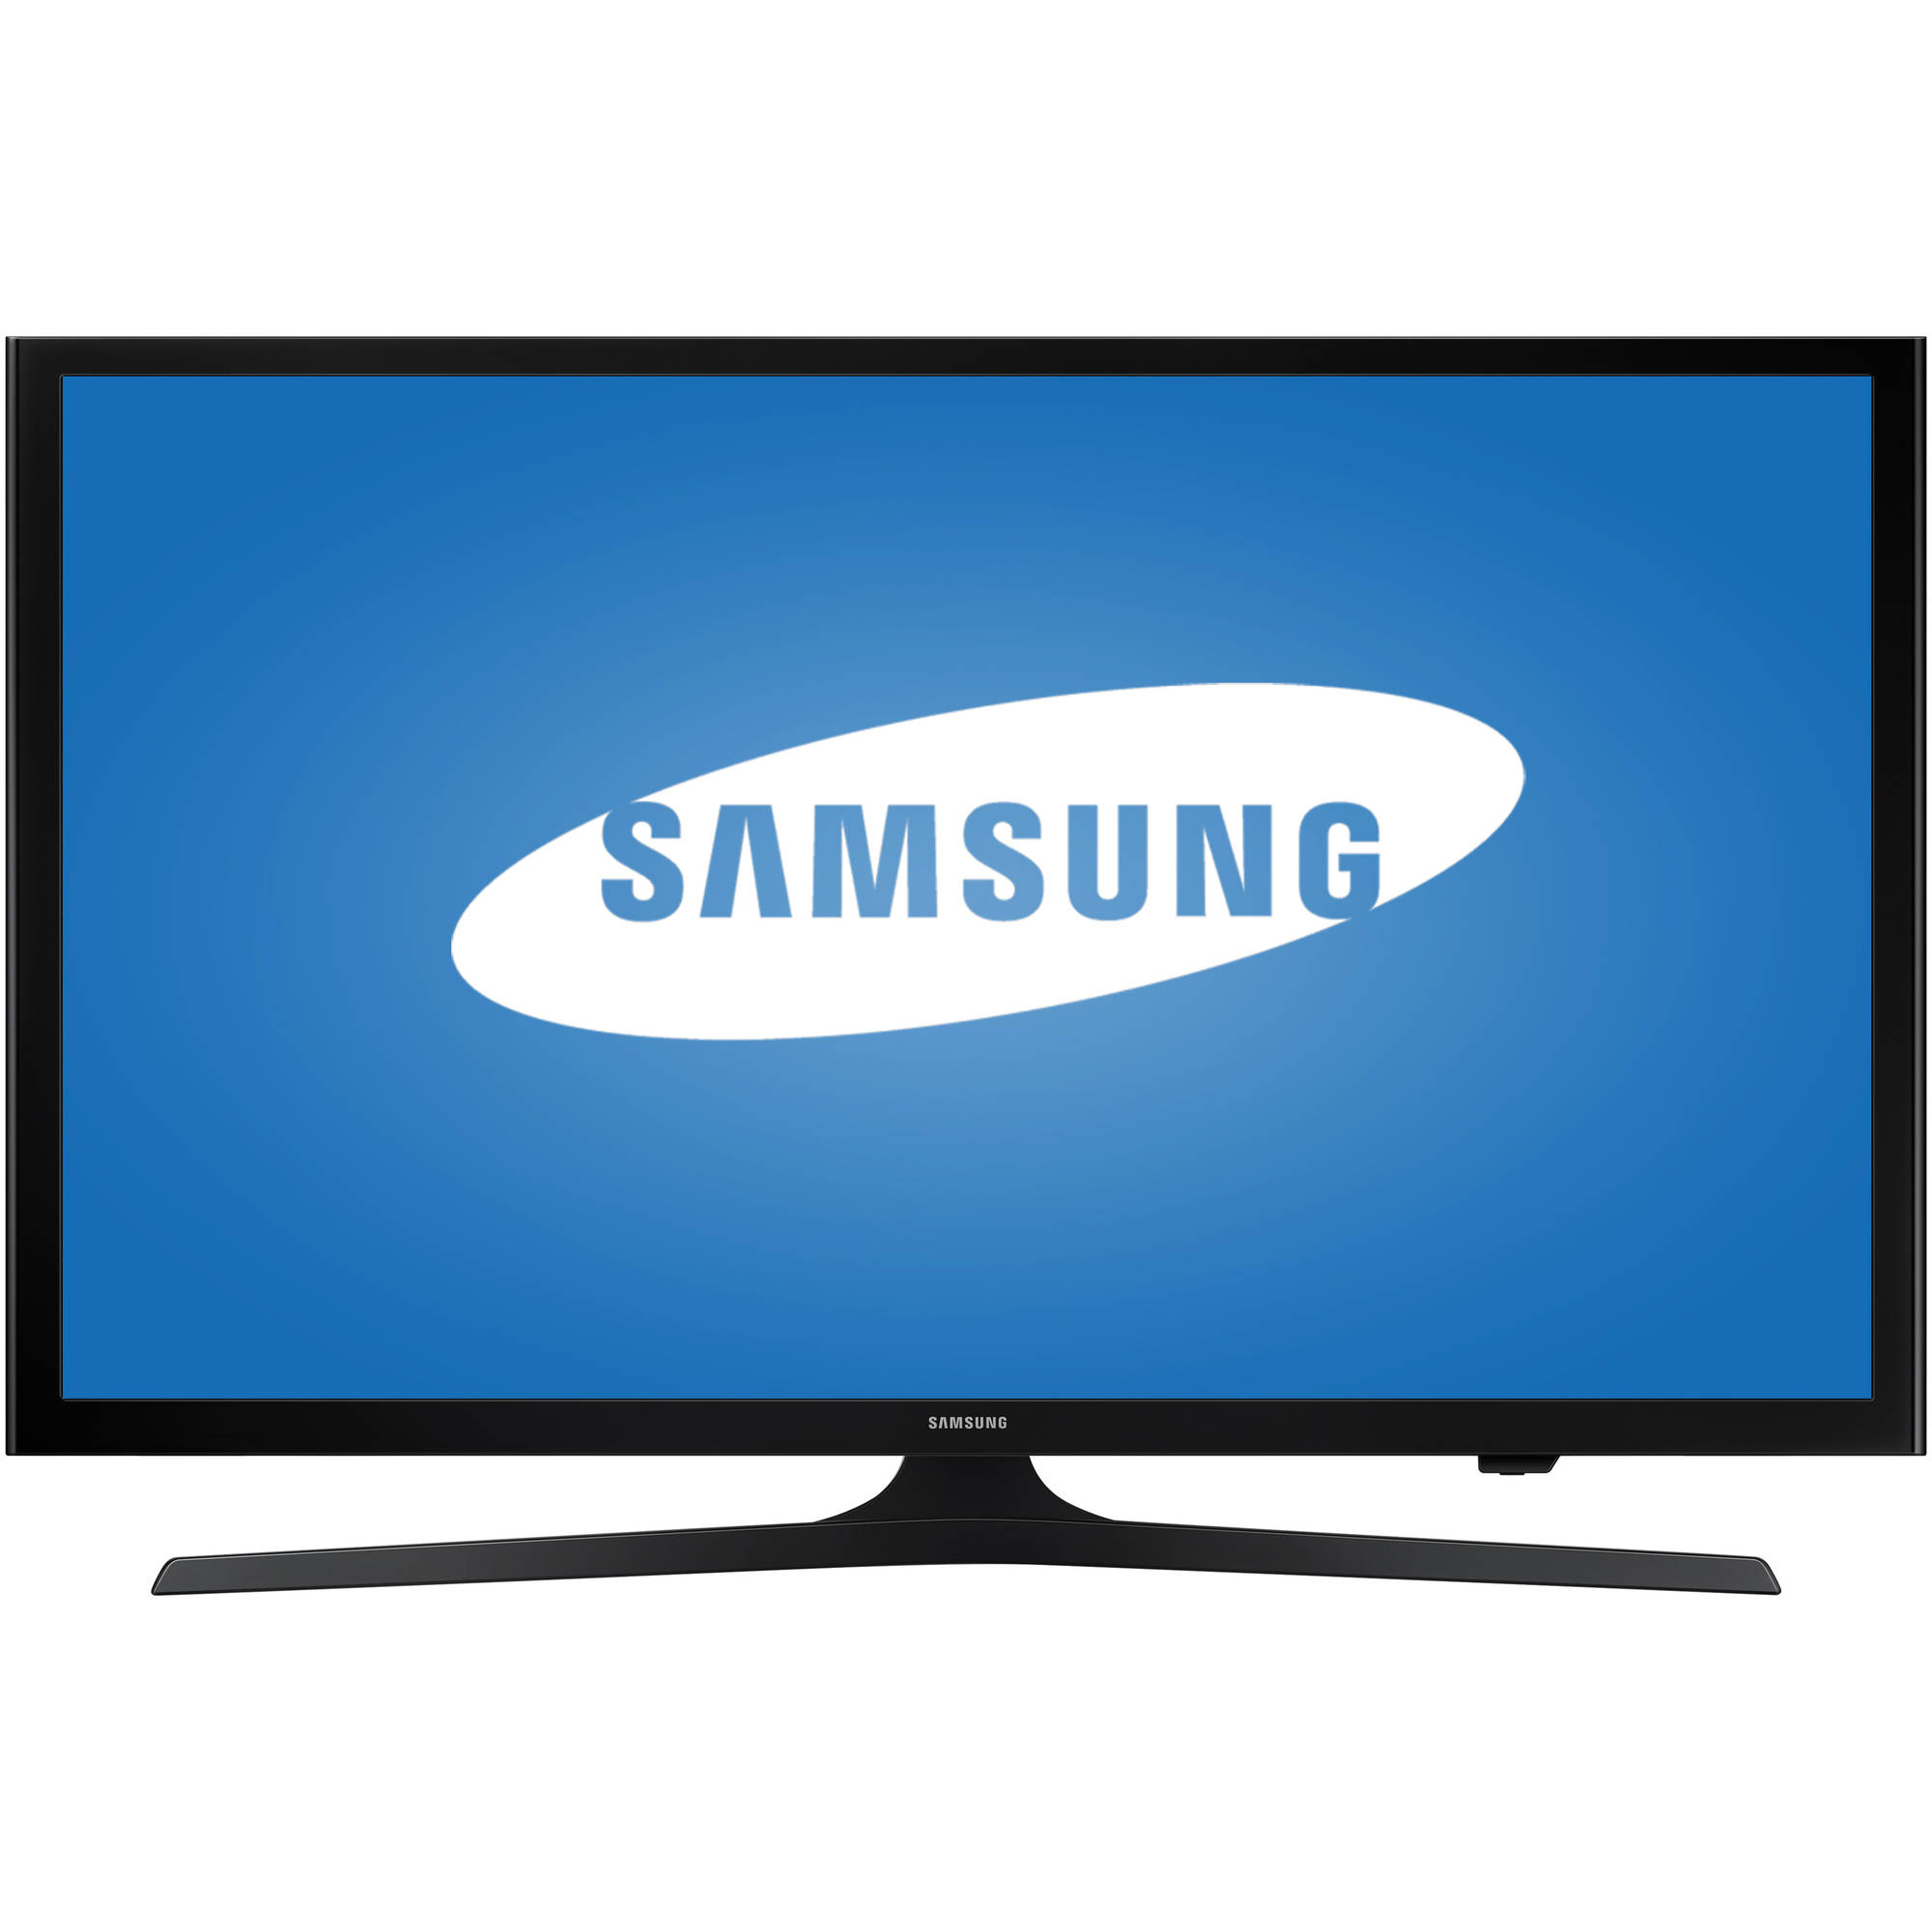 "Refurbished Samsung UN48J5000AFXZA 48"" 1080p 60Hz LED HDTV"